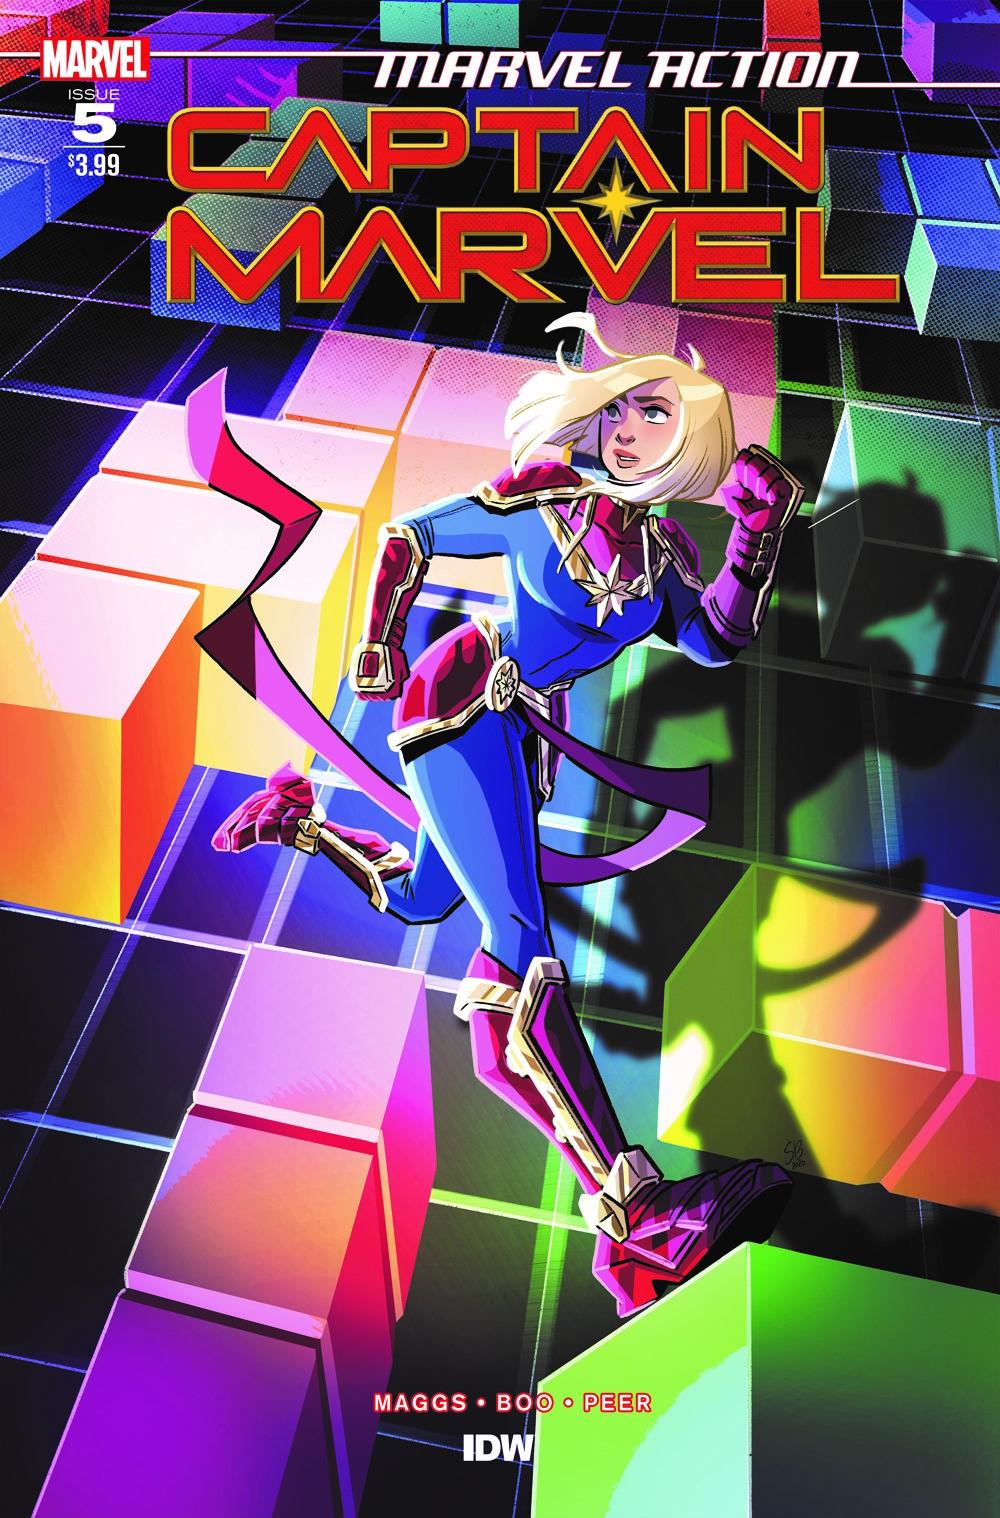 CaptainMarvel_Acvr_05 ComicList Previews: MARVEL ACTION CAPTAIN MARVEL VOLUME 2 #5